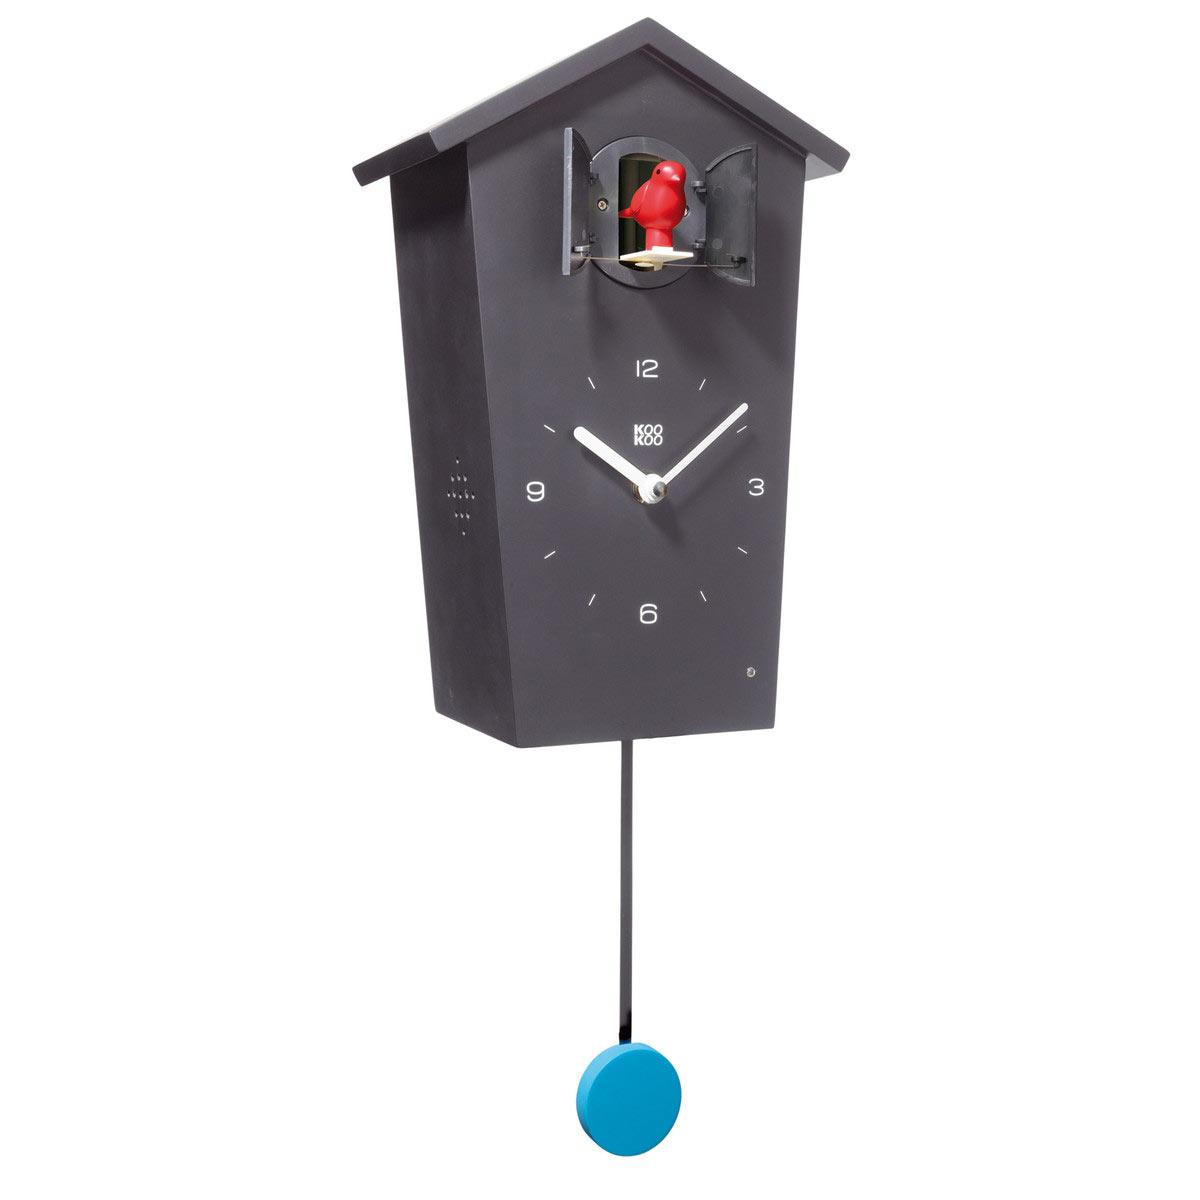 KooKoo BirdHouse cuckoo clock - black | The Design Gift Shop